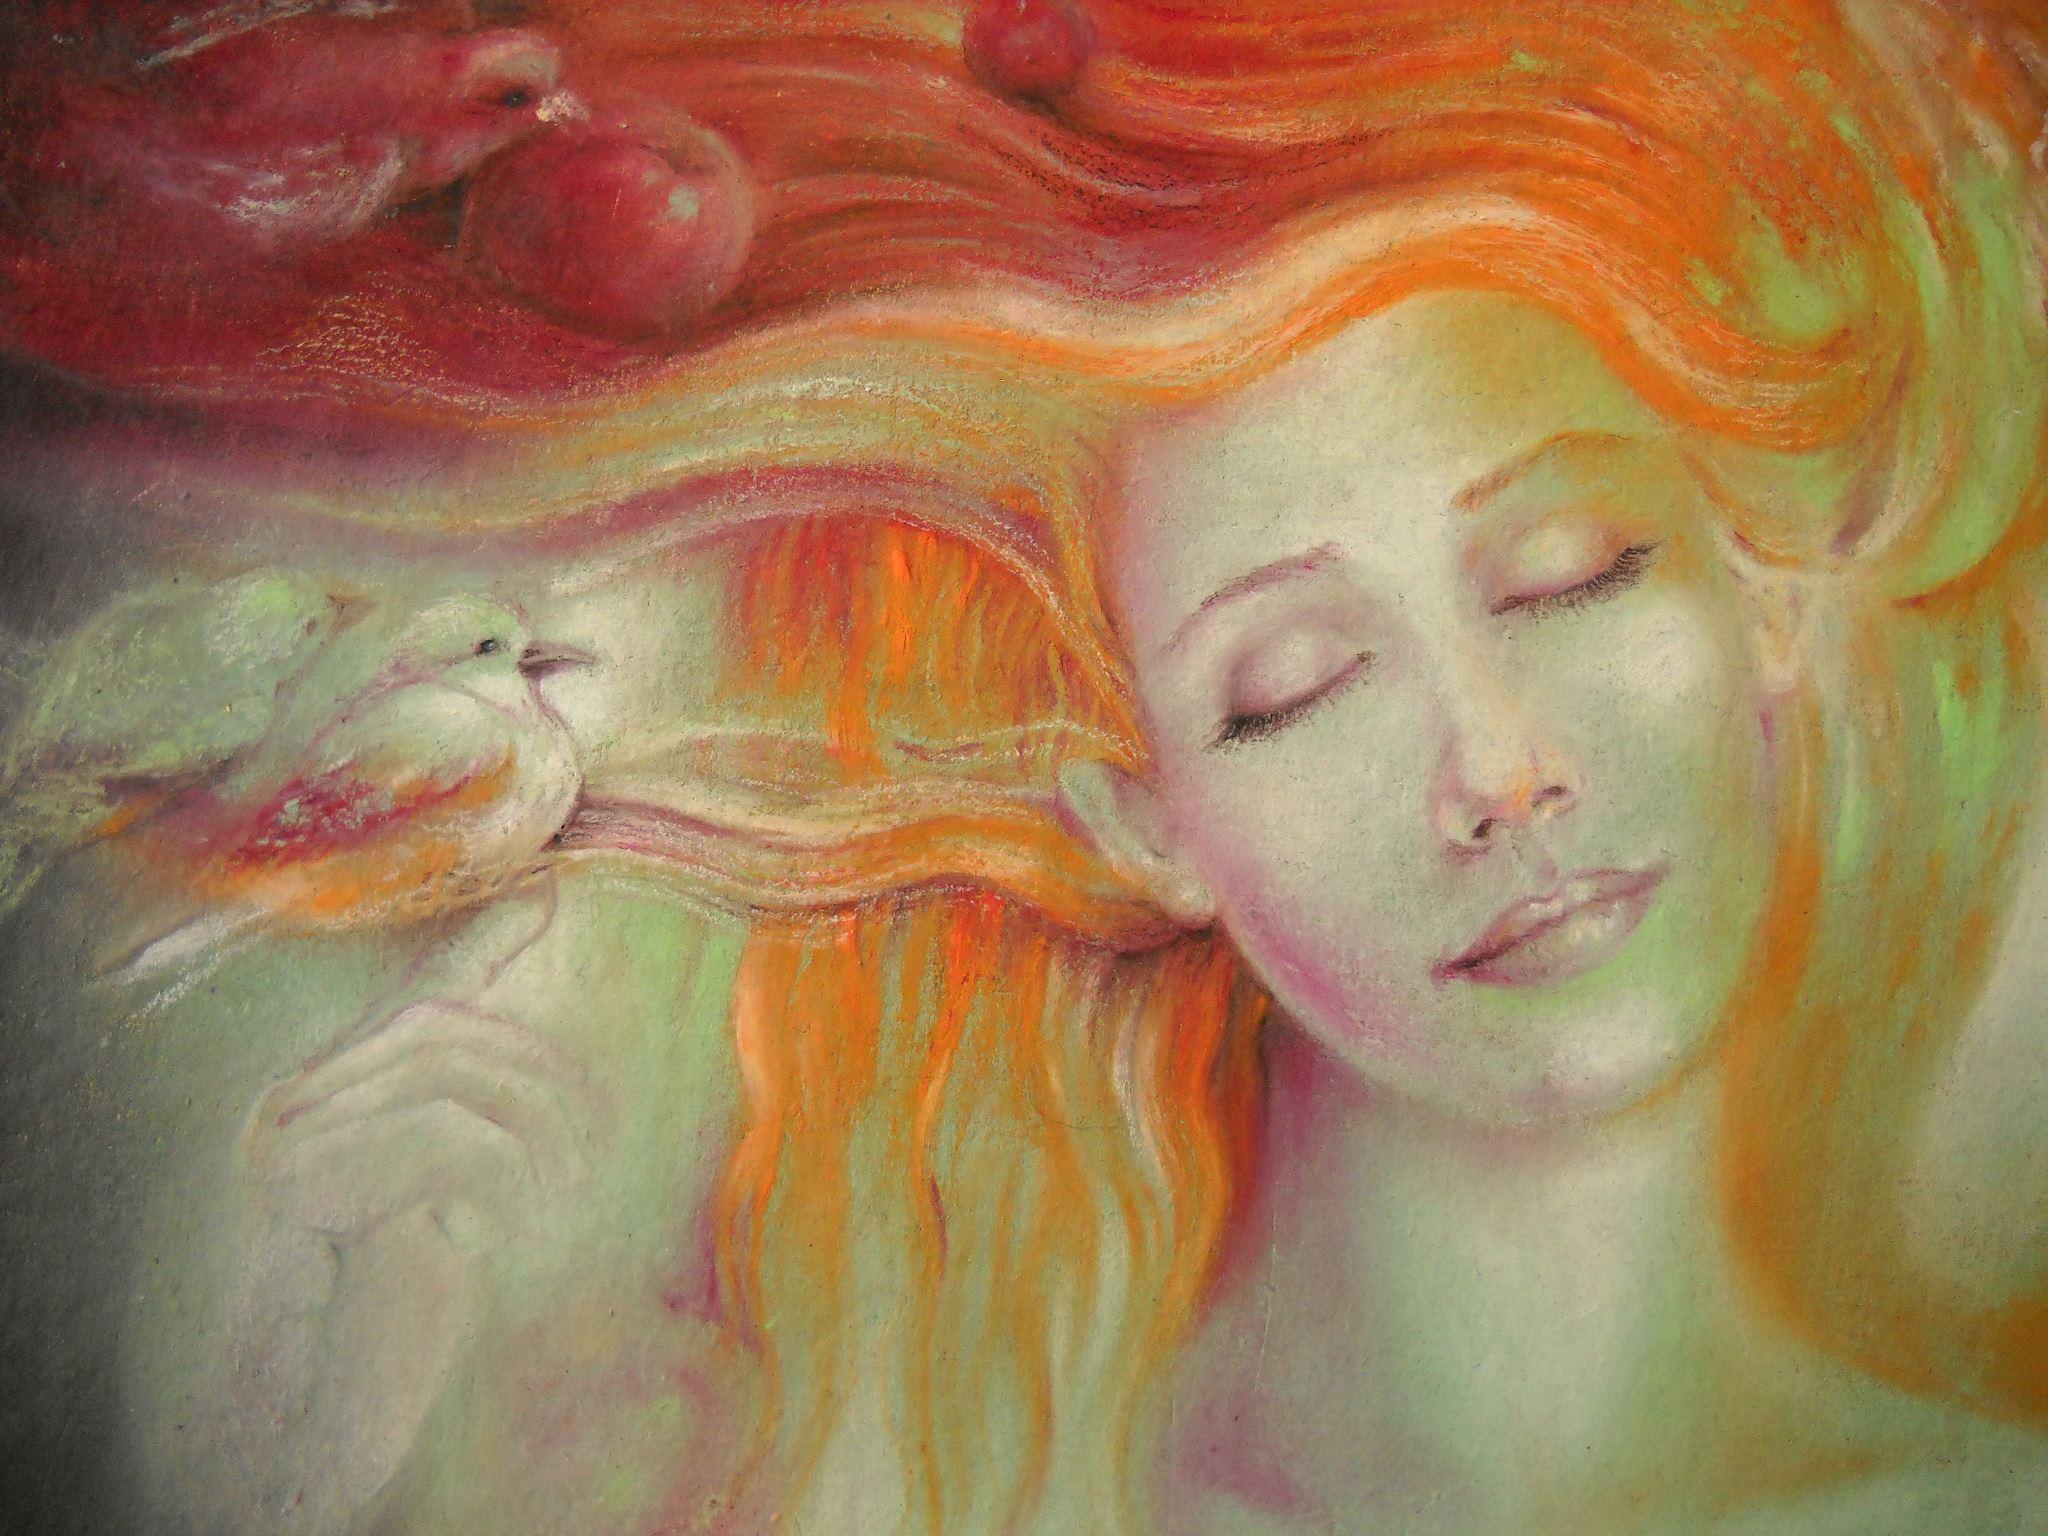 Image from newoma.wordpress.com